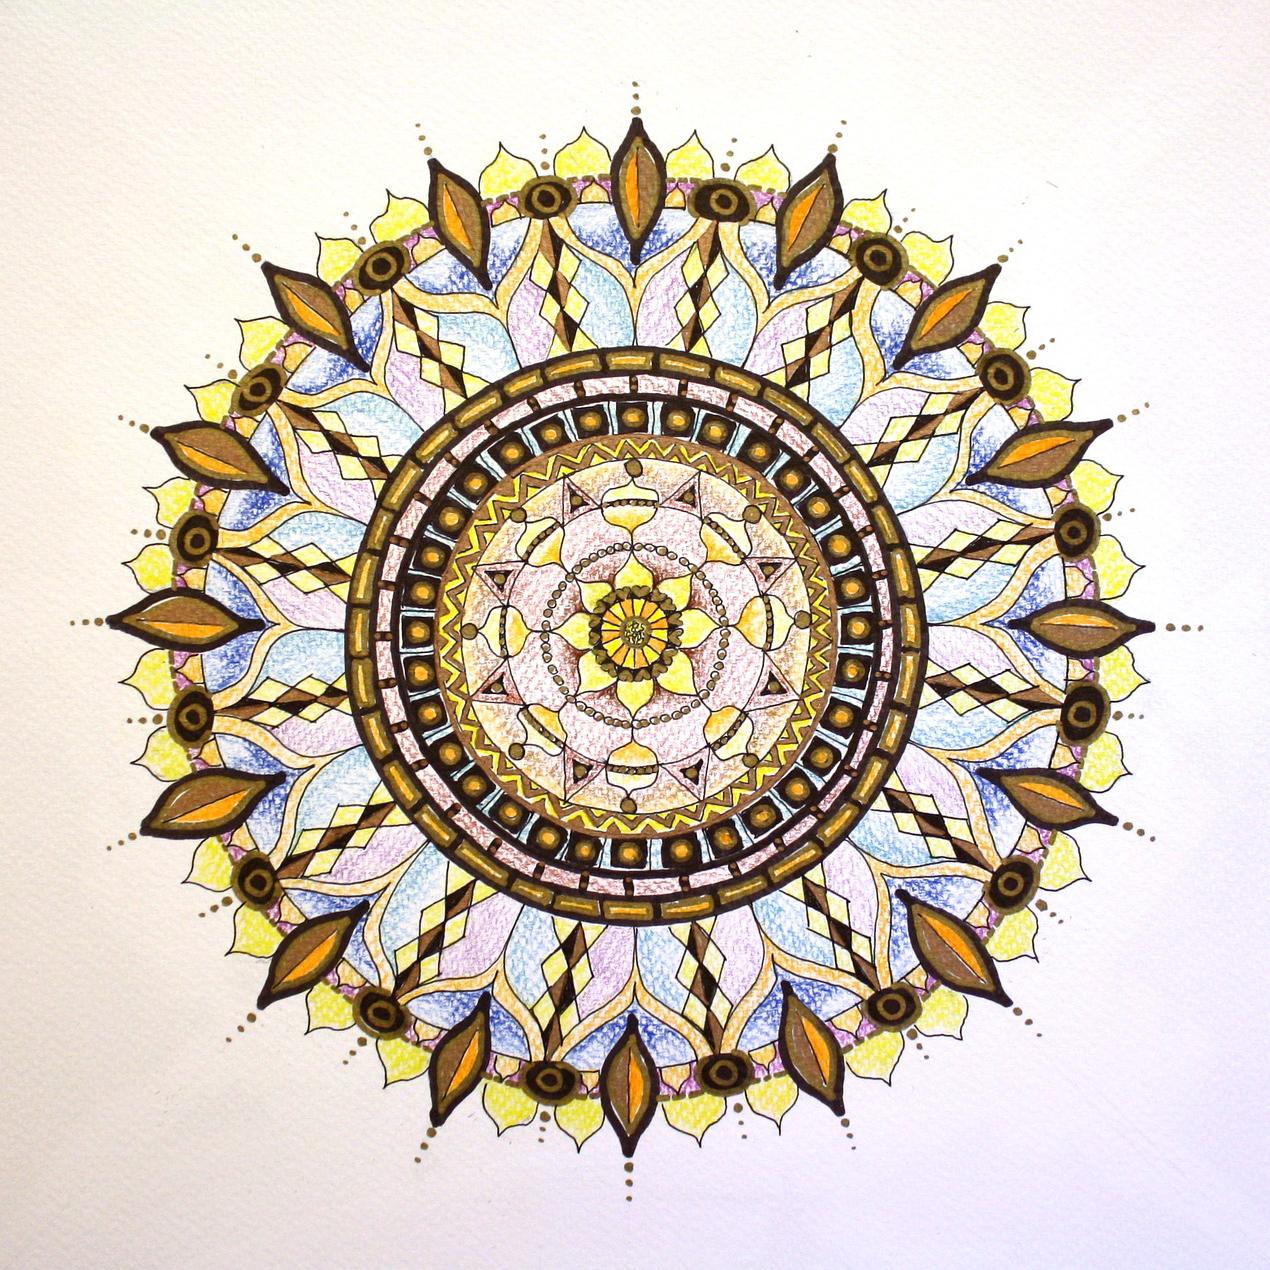 An image of a mandala.